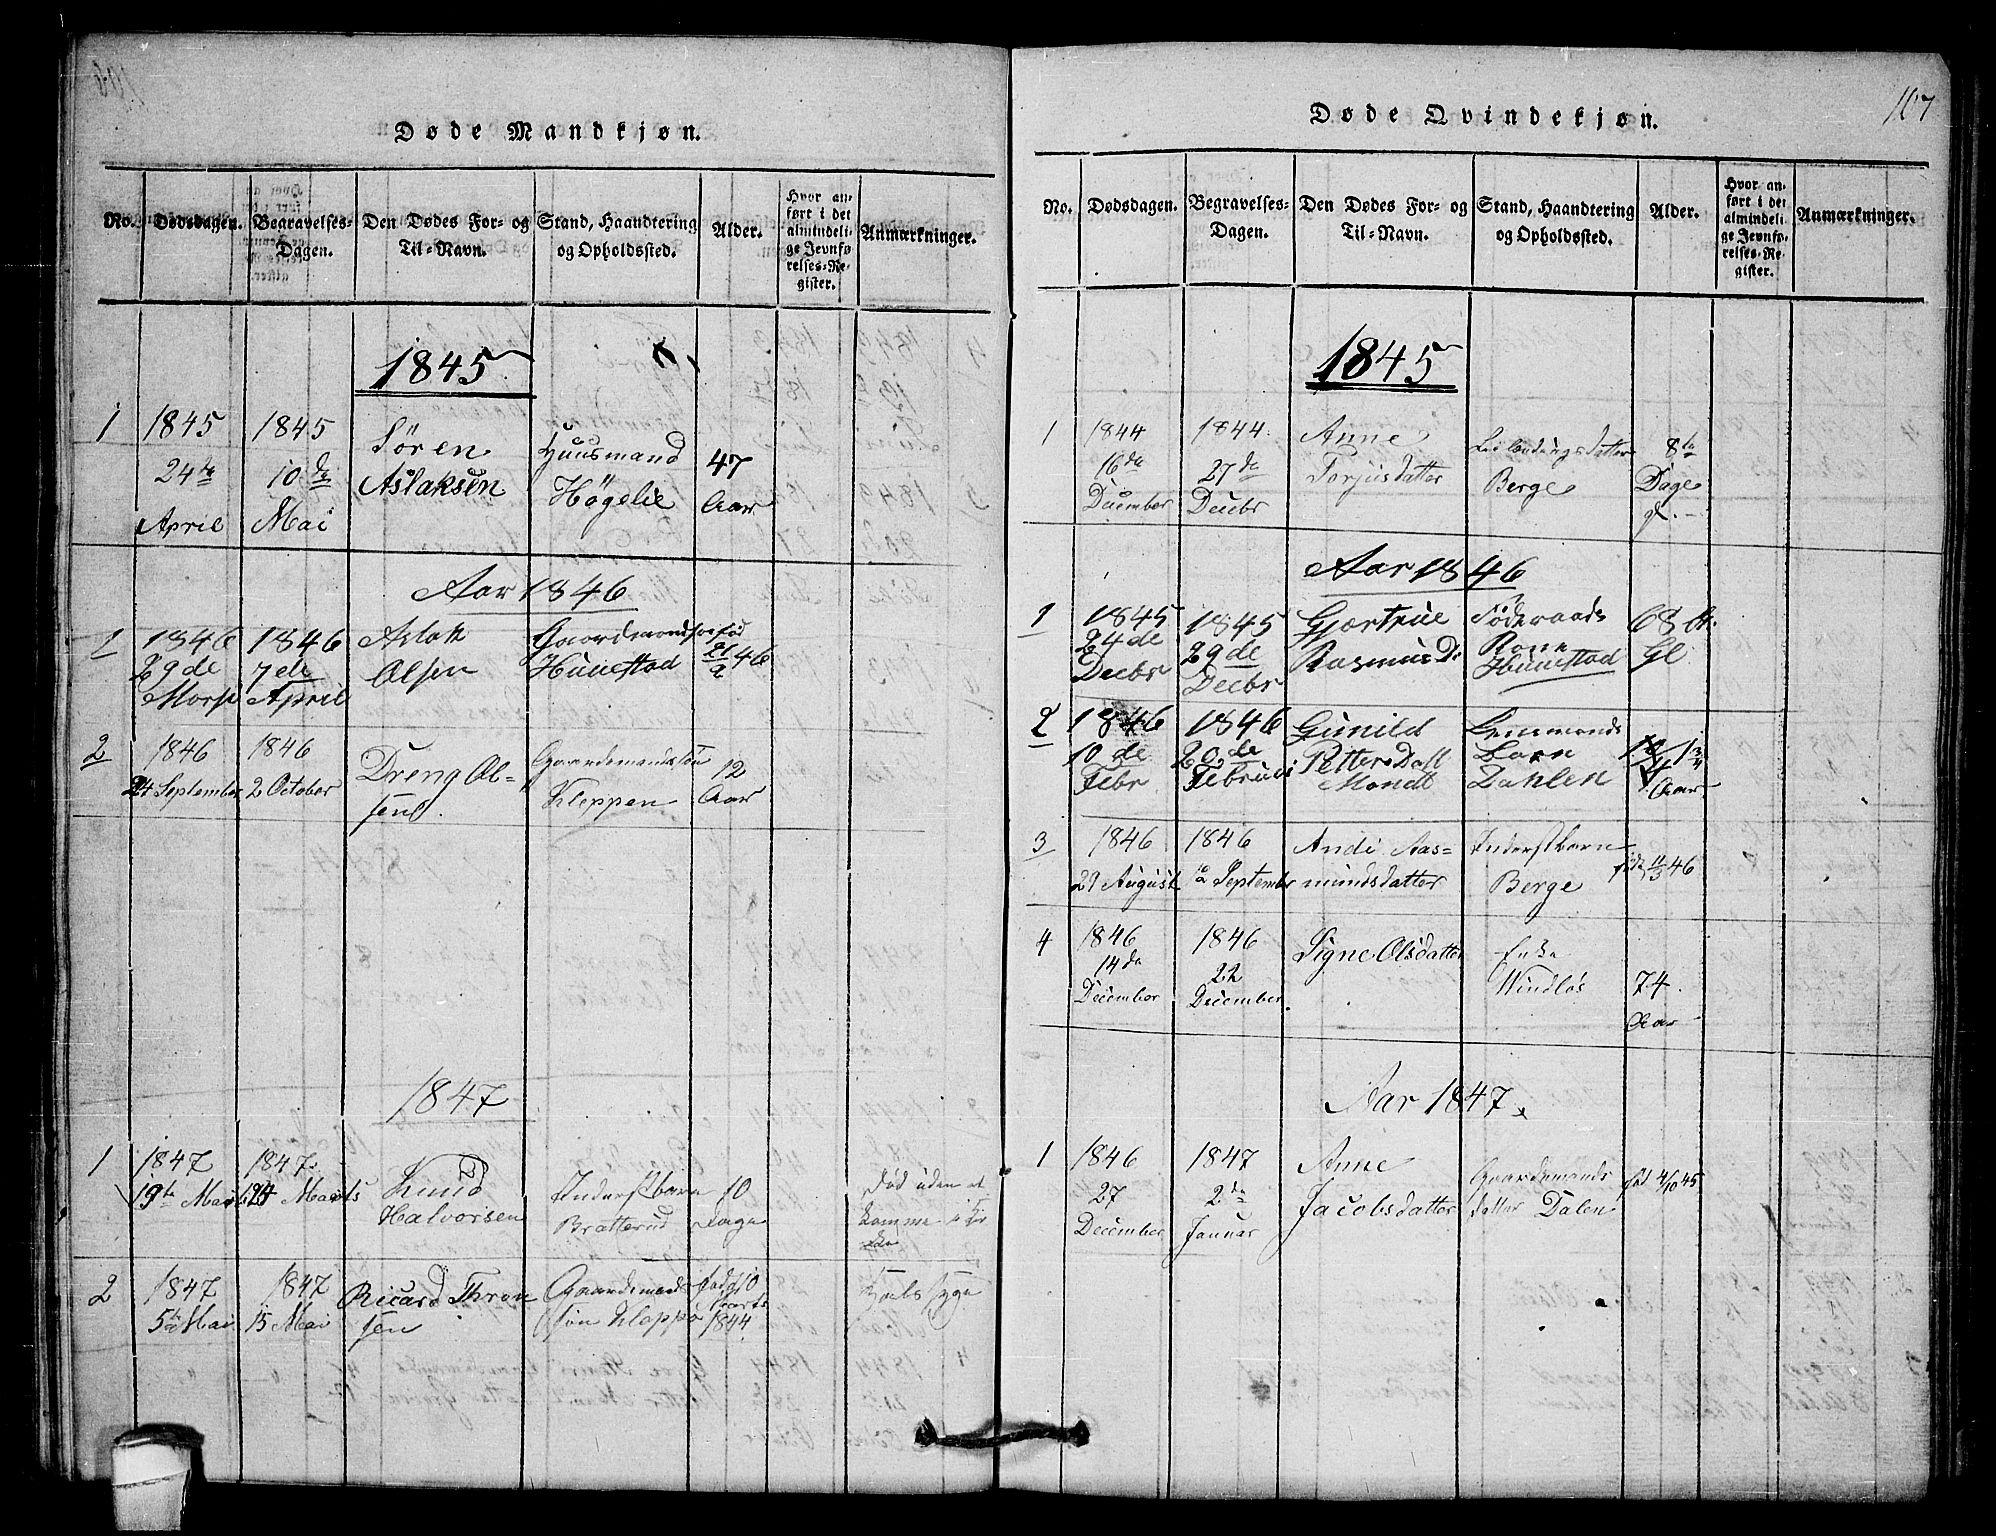 SAKO, Lårdal kirkebøker, G/Gb/L0001: Klokkerbok nr. II 1, 1815-1865, s. 107